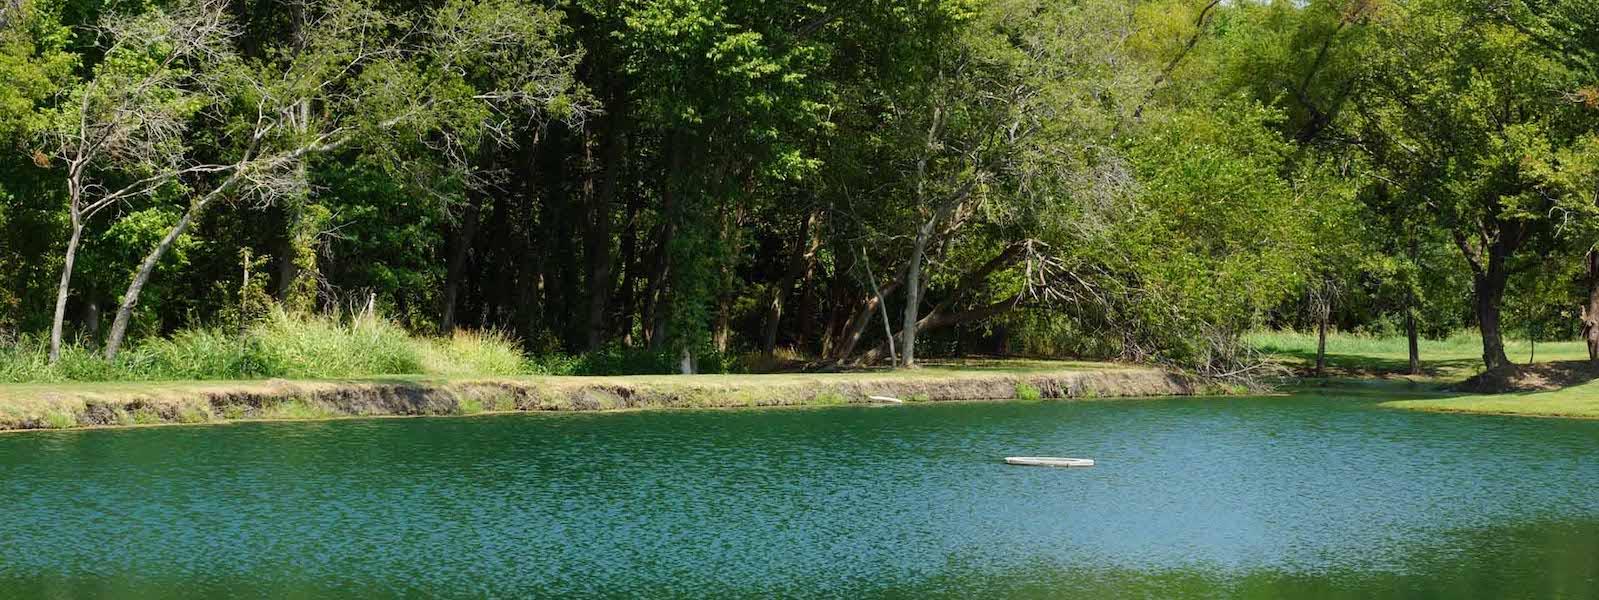 christie farms in prosper has amazing ponds